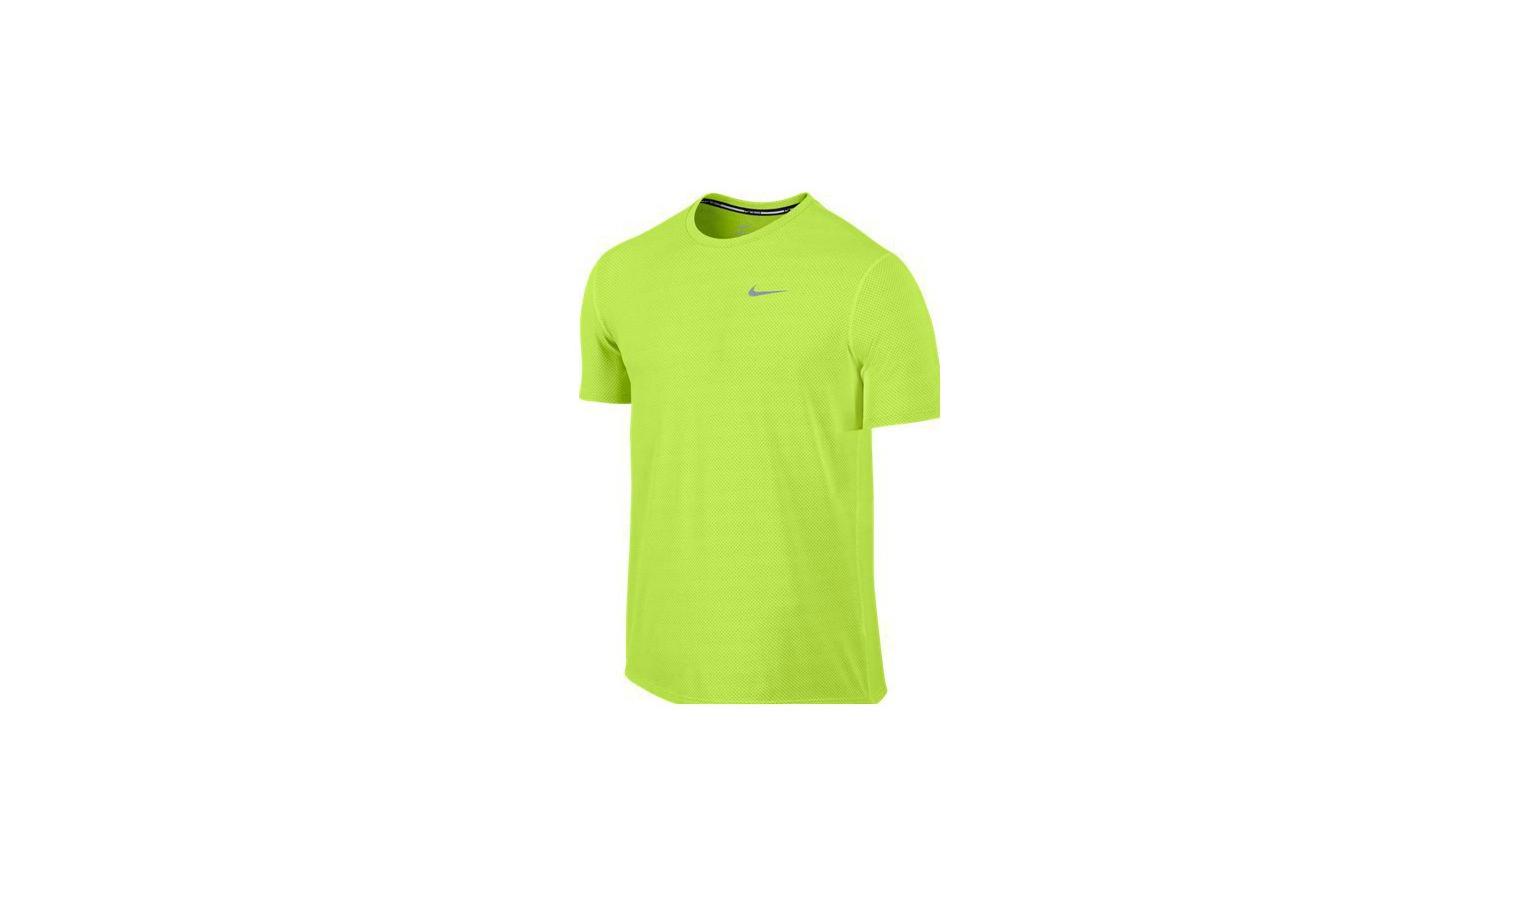 452b72b8a6ef Pánske bežecké tričko Nike DRI-FIT CONTOUR žlté